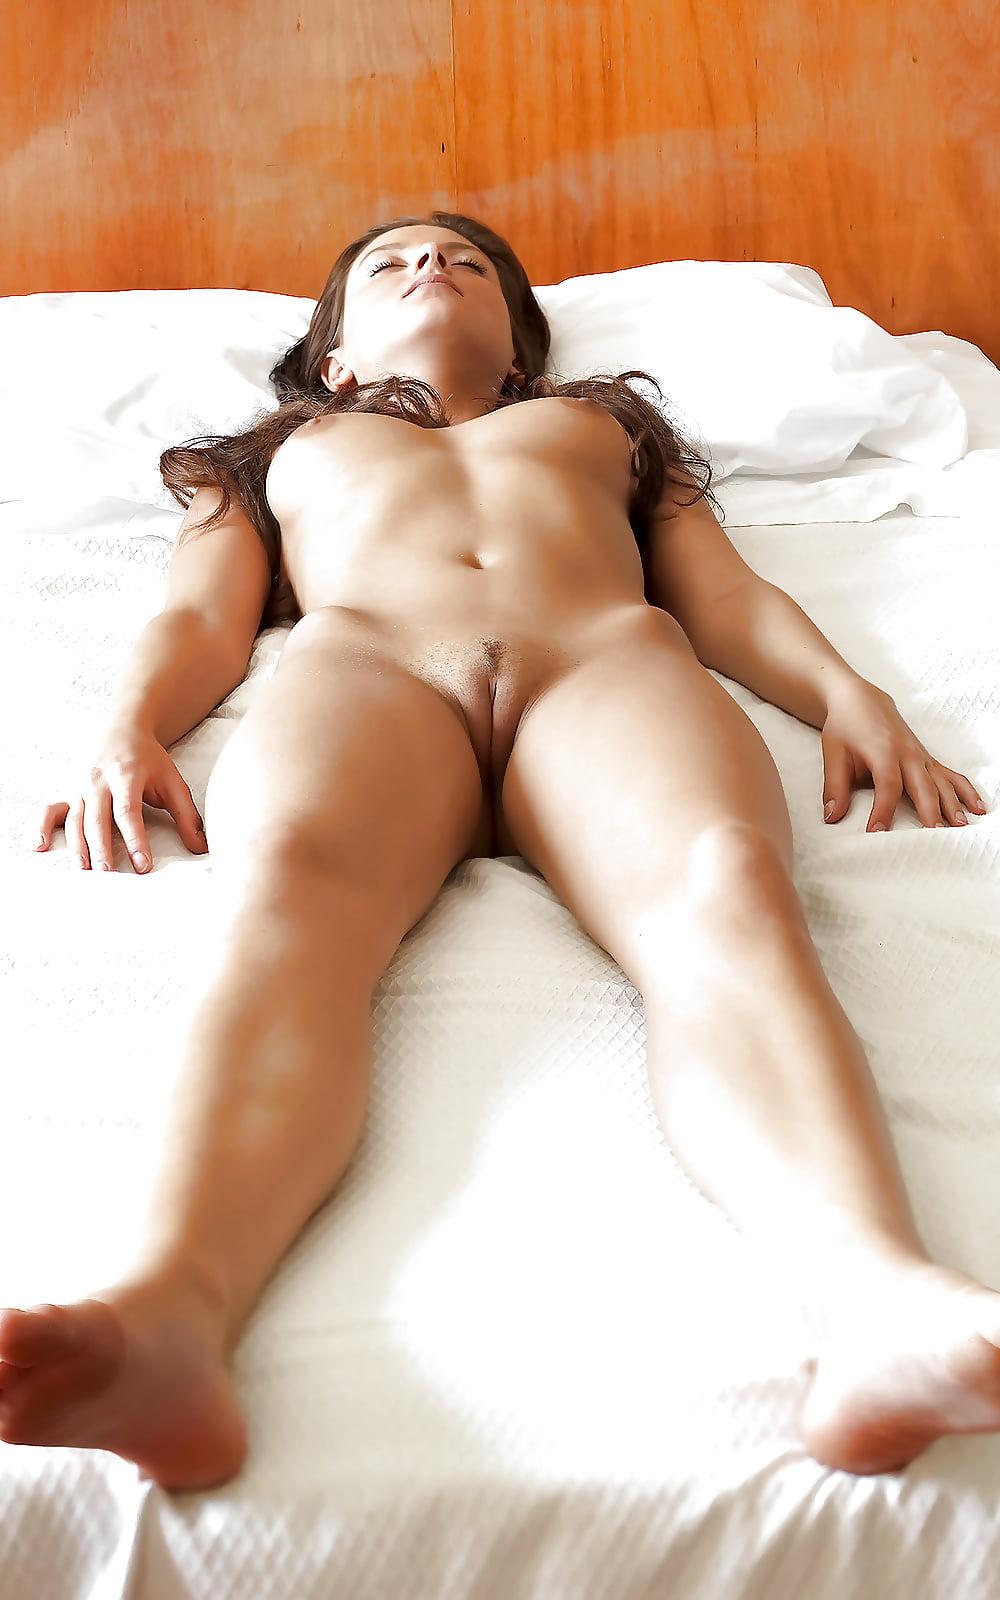 Вид пизды лежа на спине порно фото #7